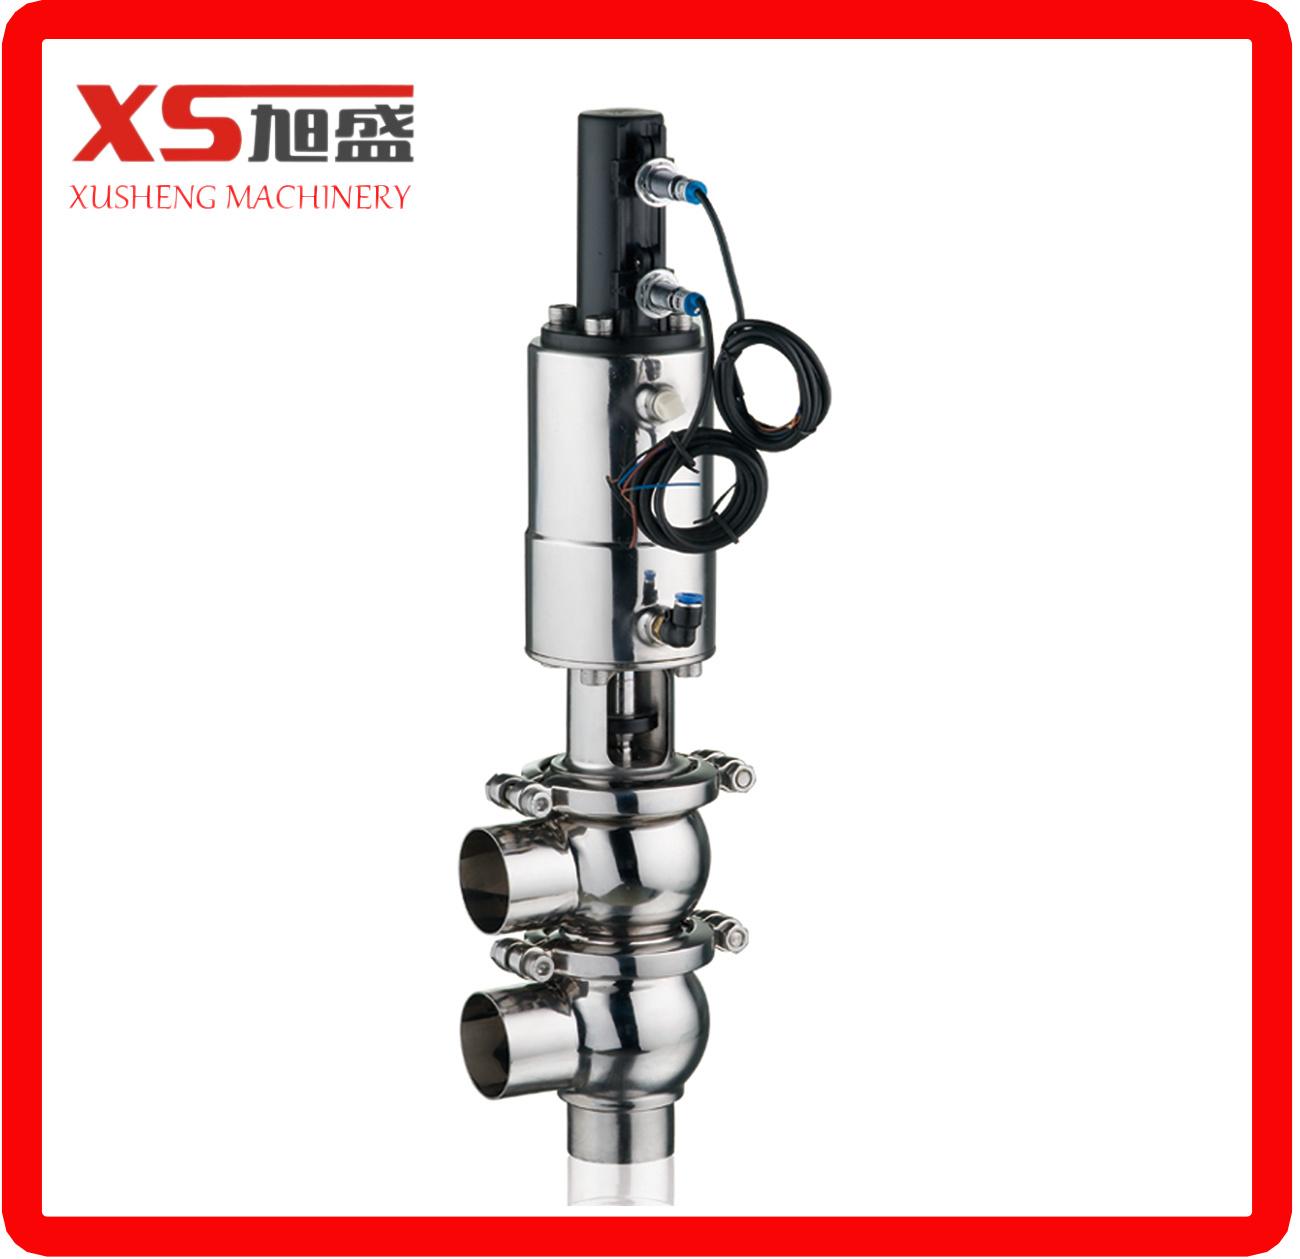 Sanitary Hygienic Stainless Steel Ss304 Ss316L Pneumatic Diverter Flow Valve